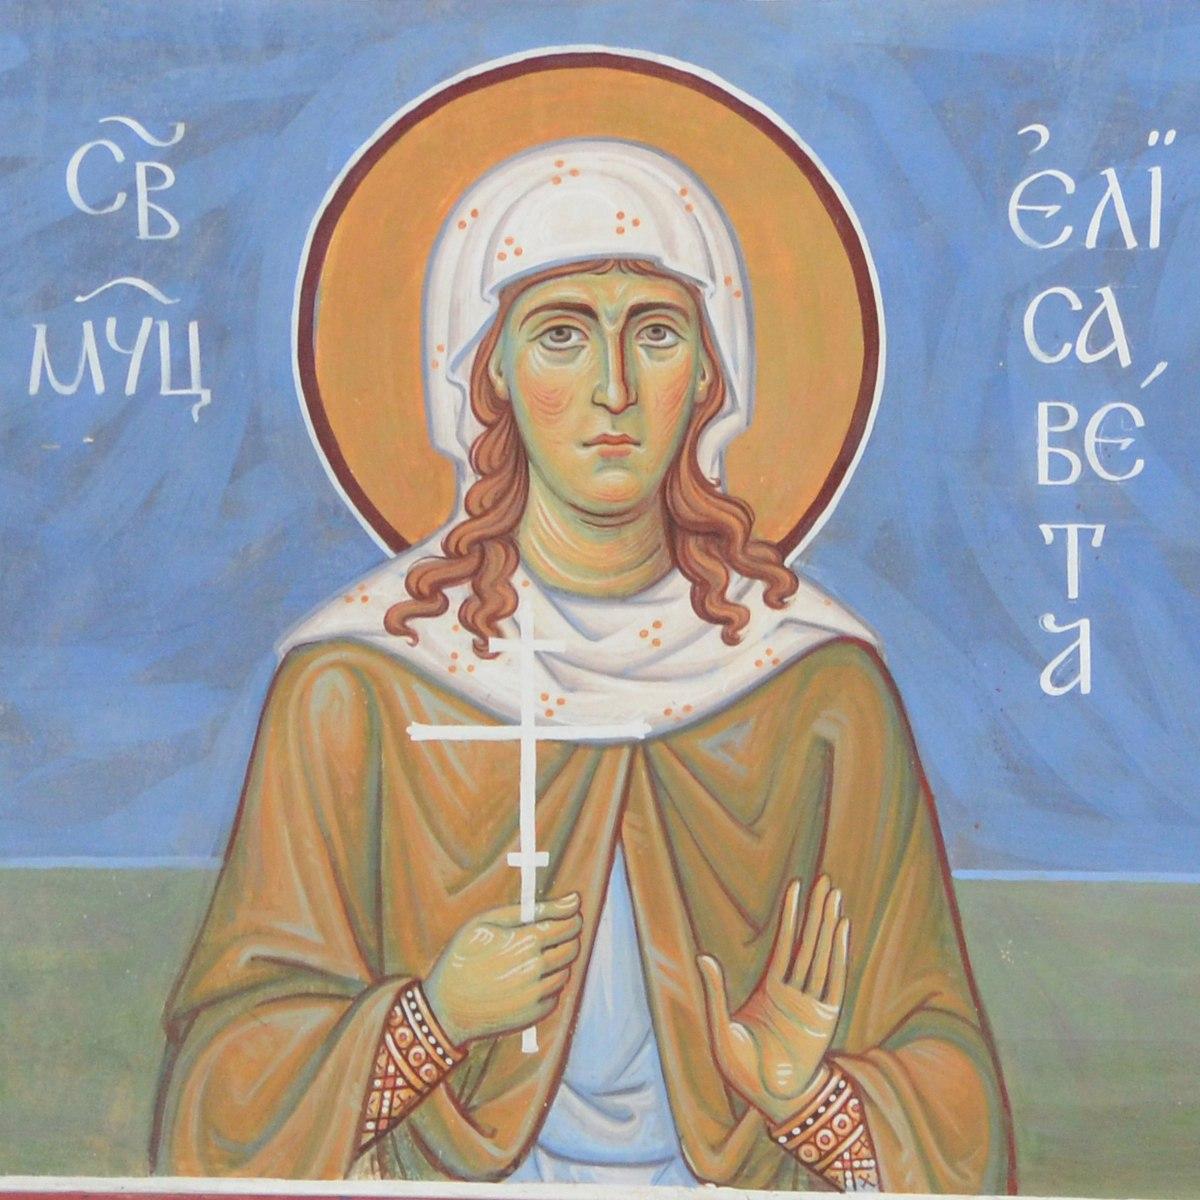 Мученица Елисавета Крымова